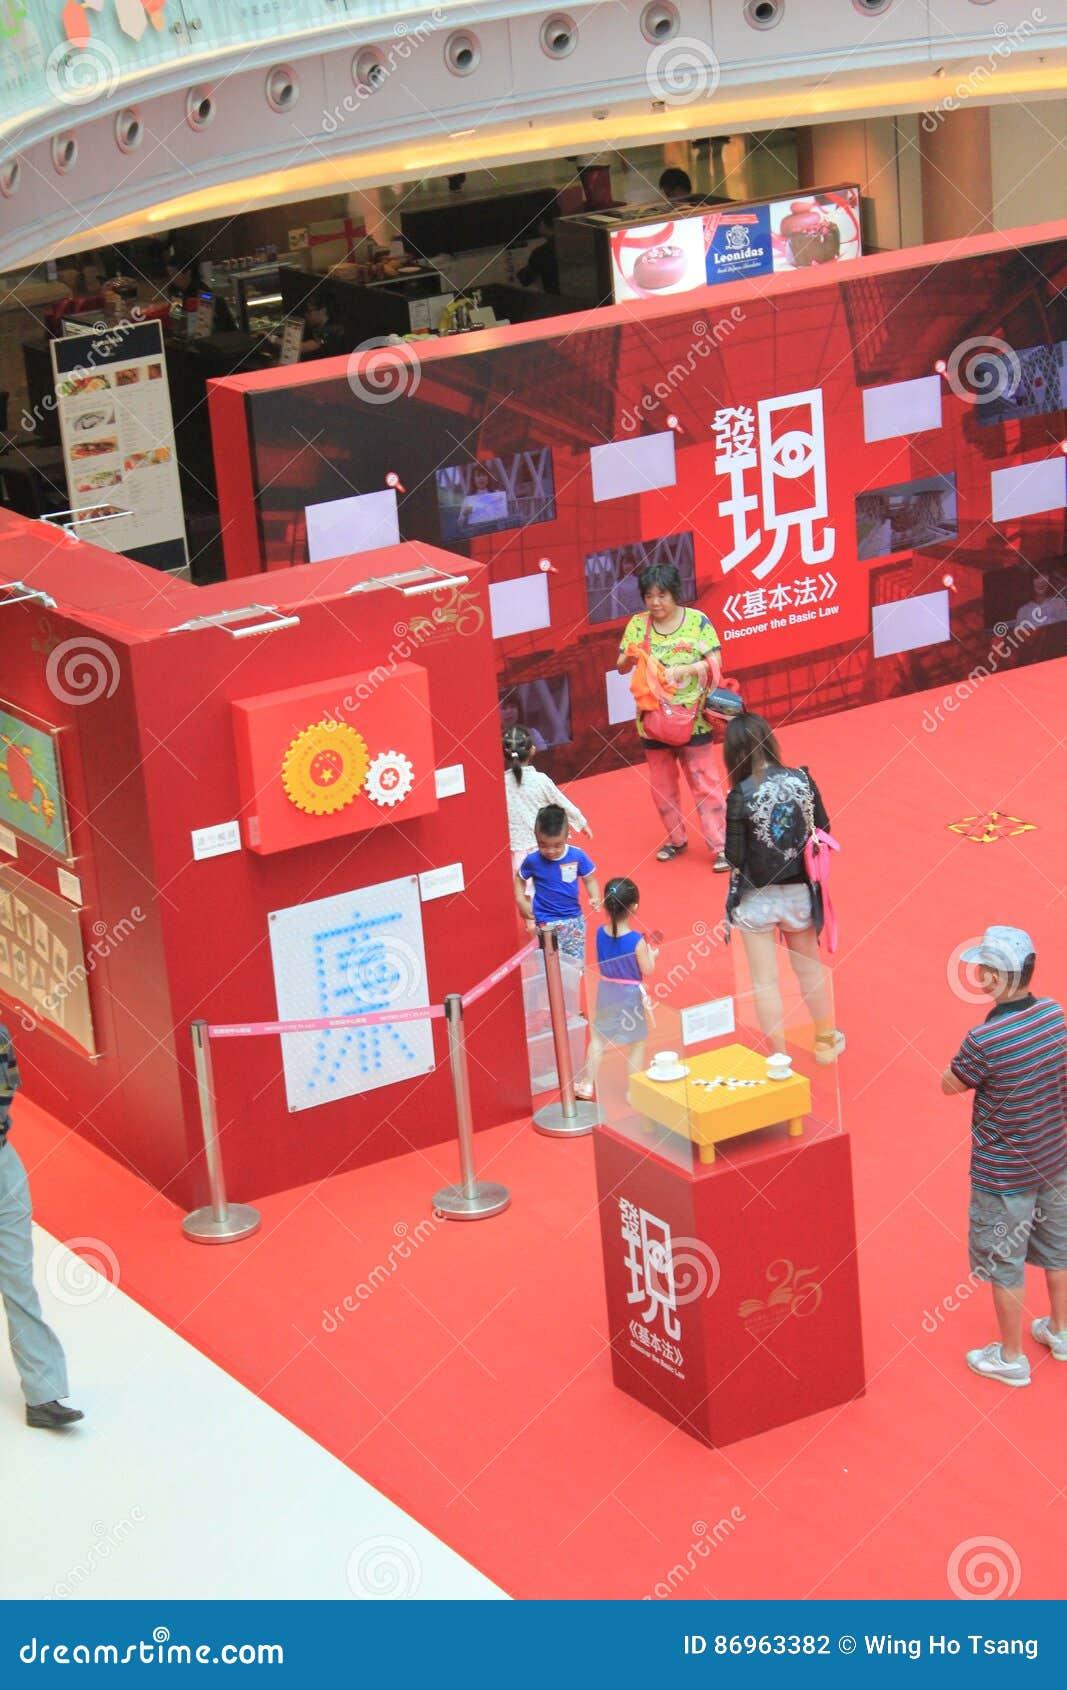 Hong Kong Odkrywa podstawowe prawo wystawę 2015